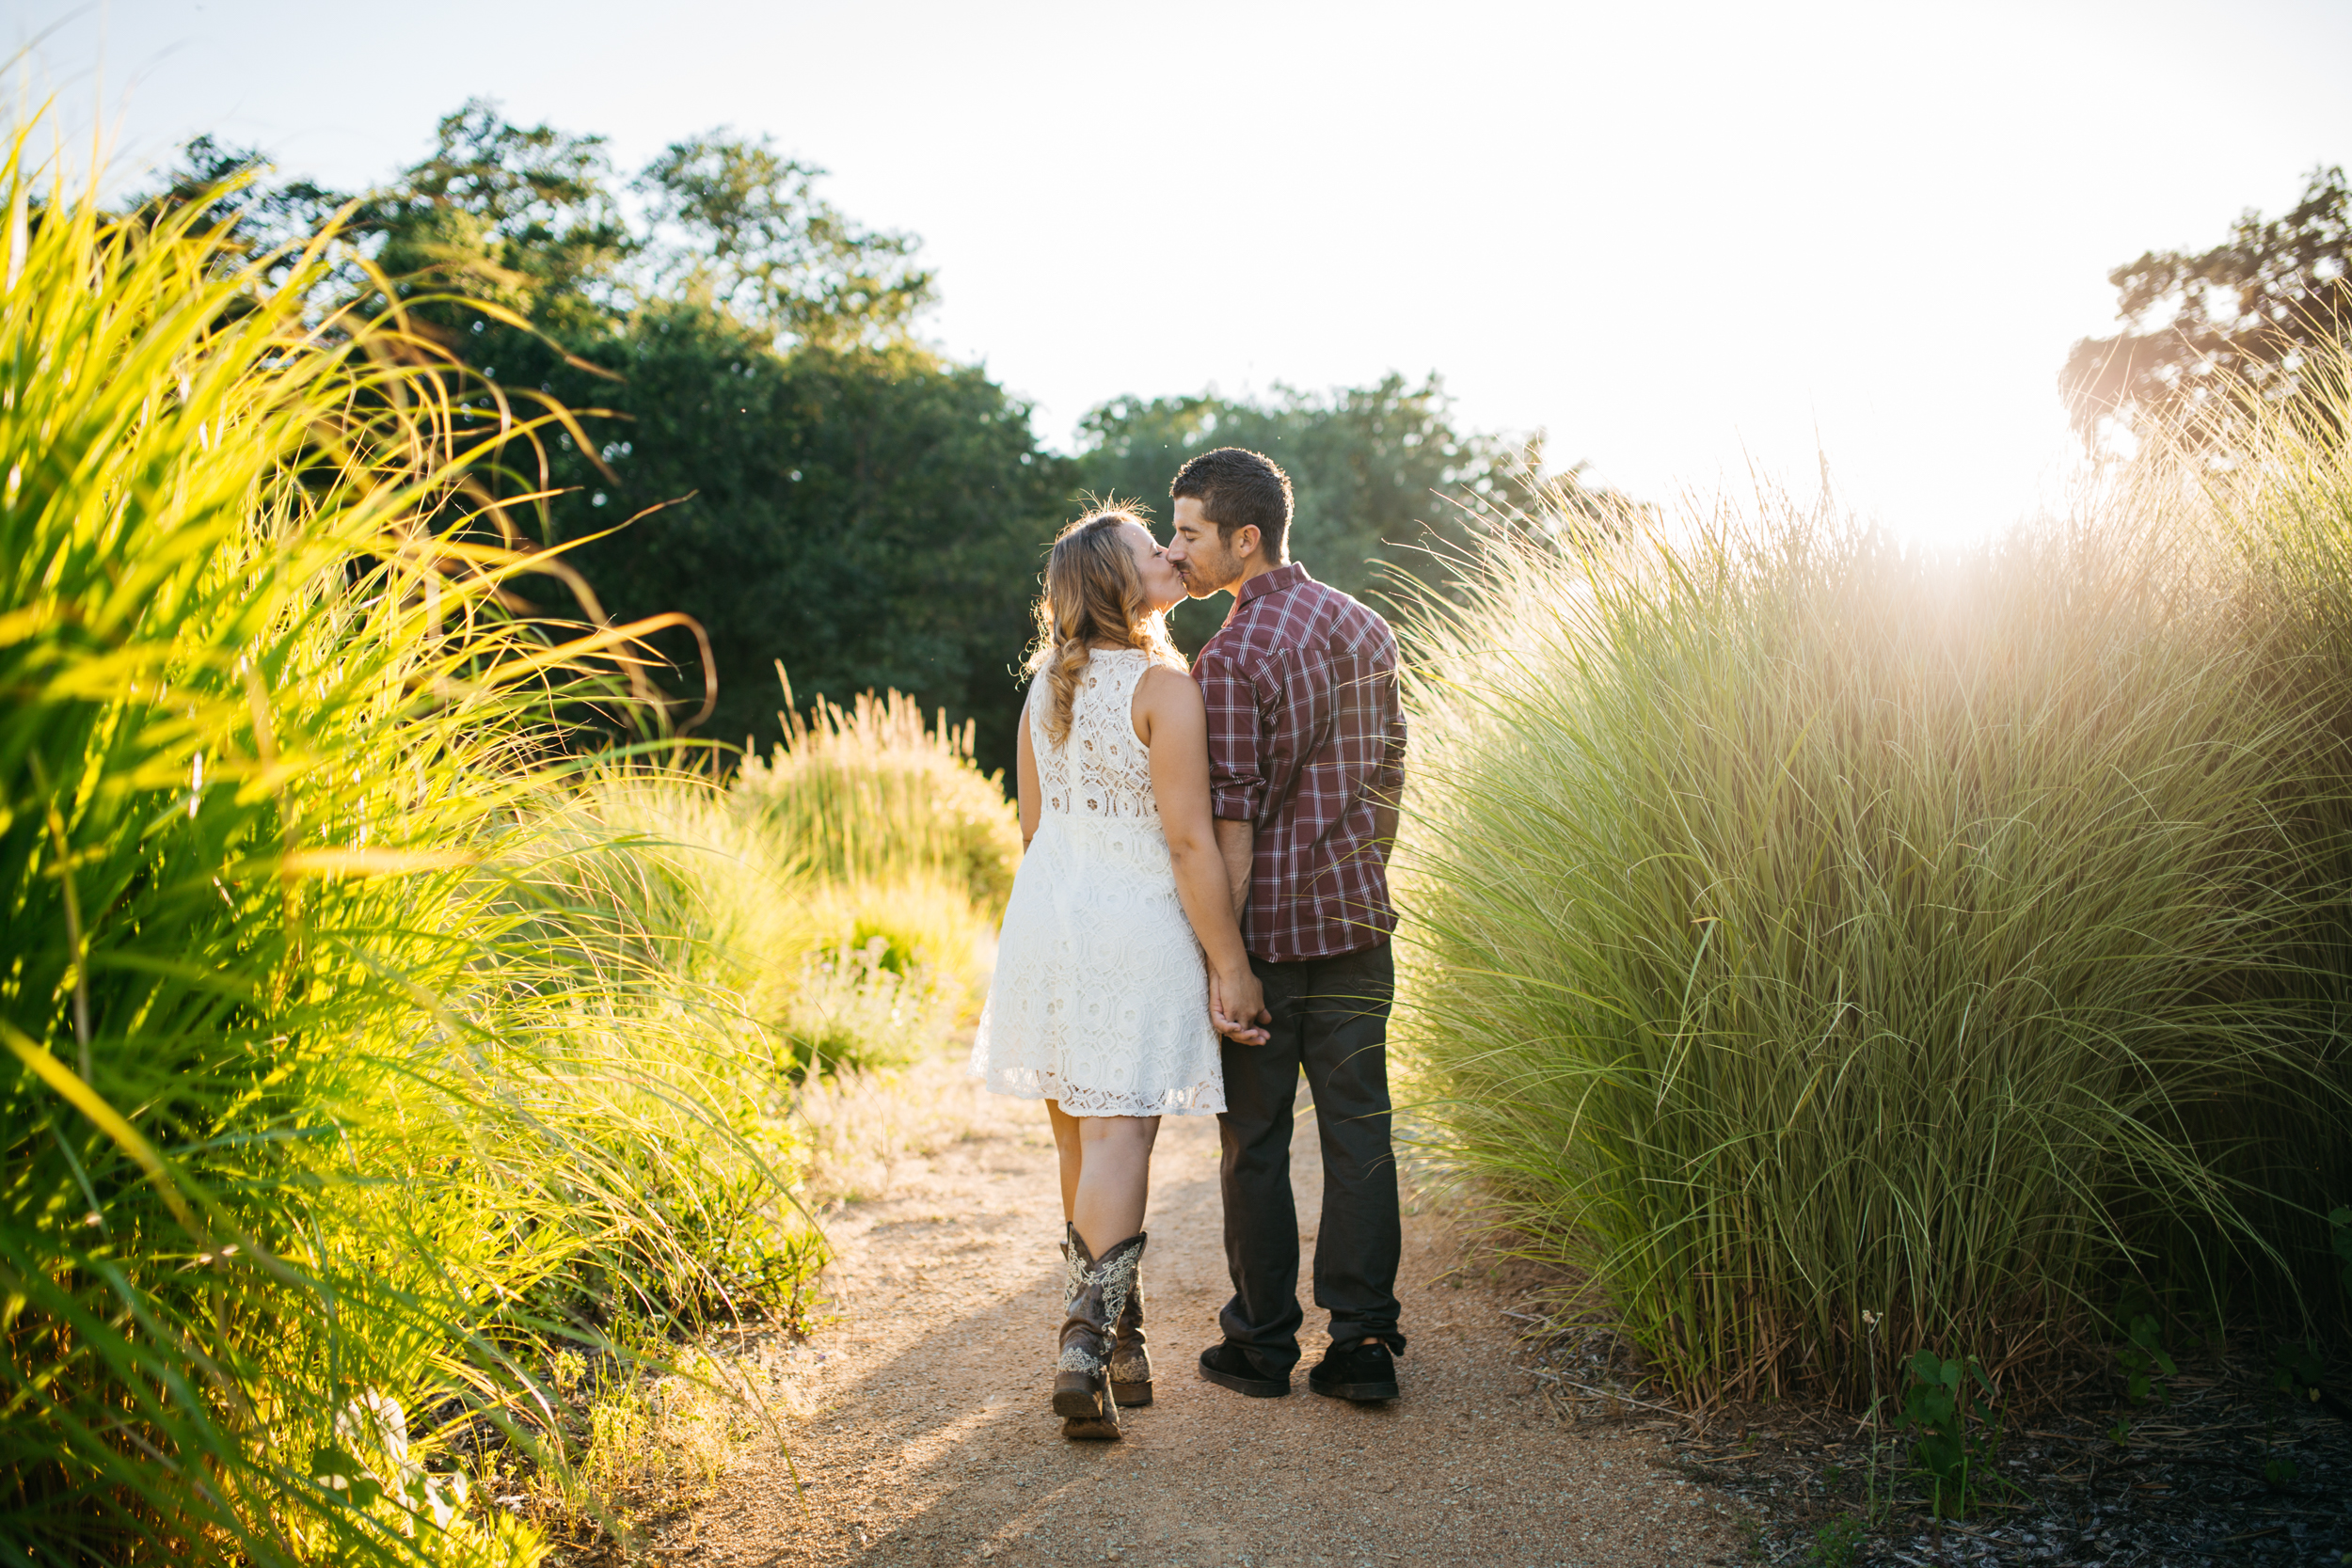 Engagement Photos-Redding-Turtle Bay-Sundial Bridge-Ranalla Photo & Films-Wedding Photography-26.jpg